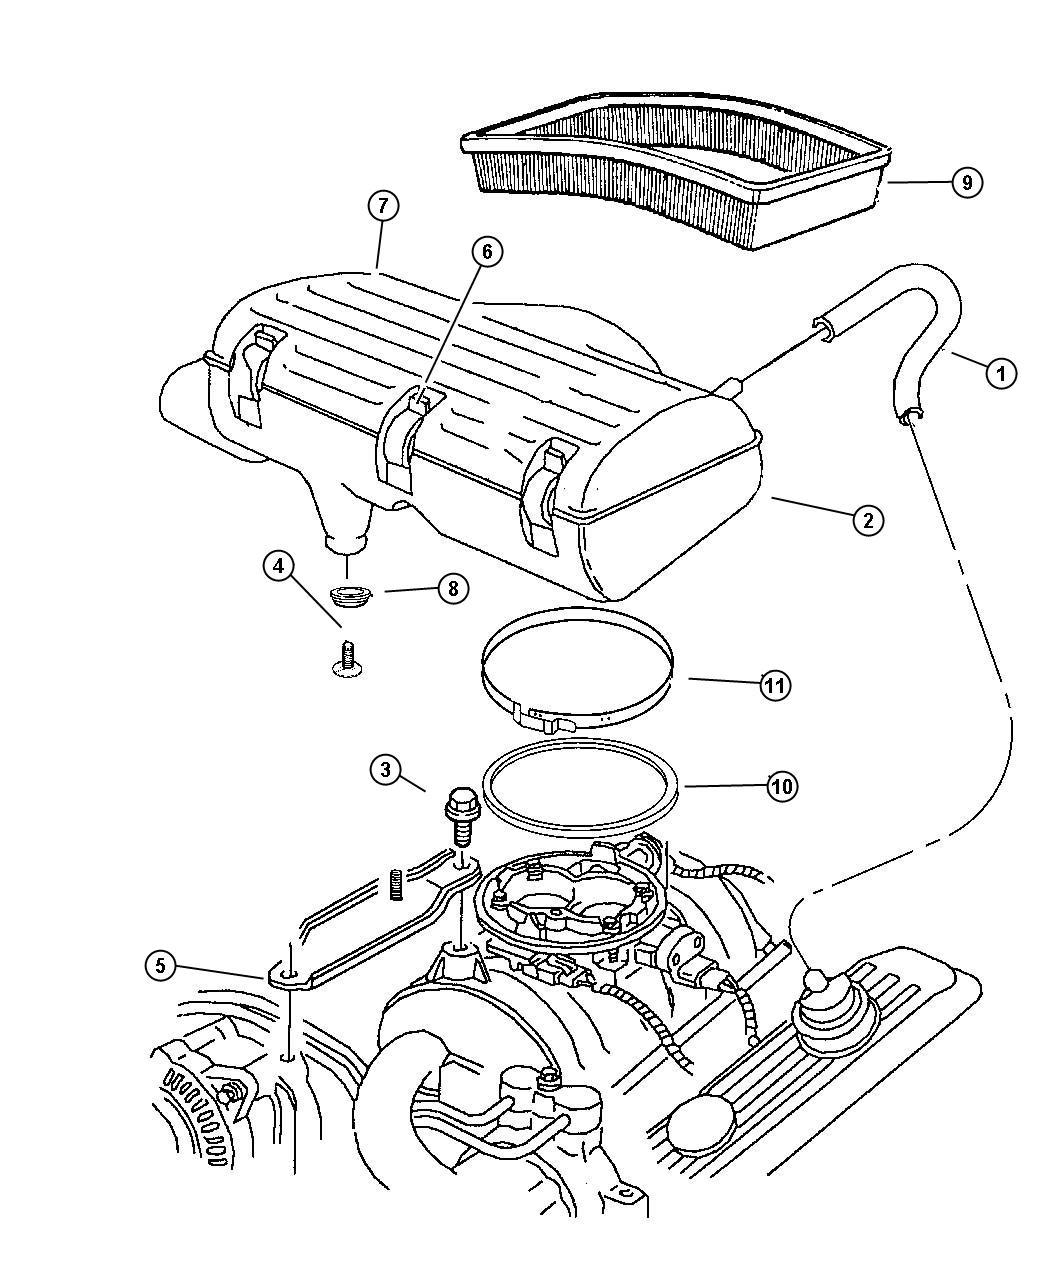 Dodge Ram 1500 Tube. Pcv valve. Fuelemissions, lecold